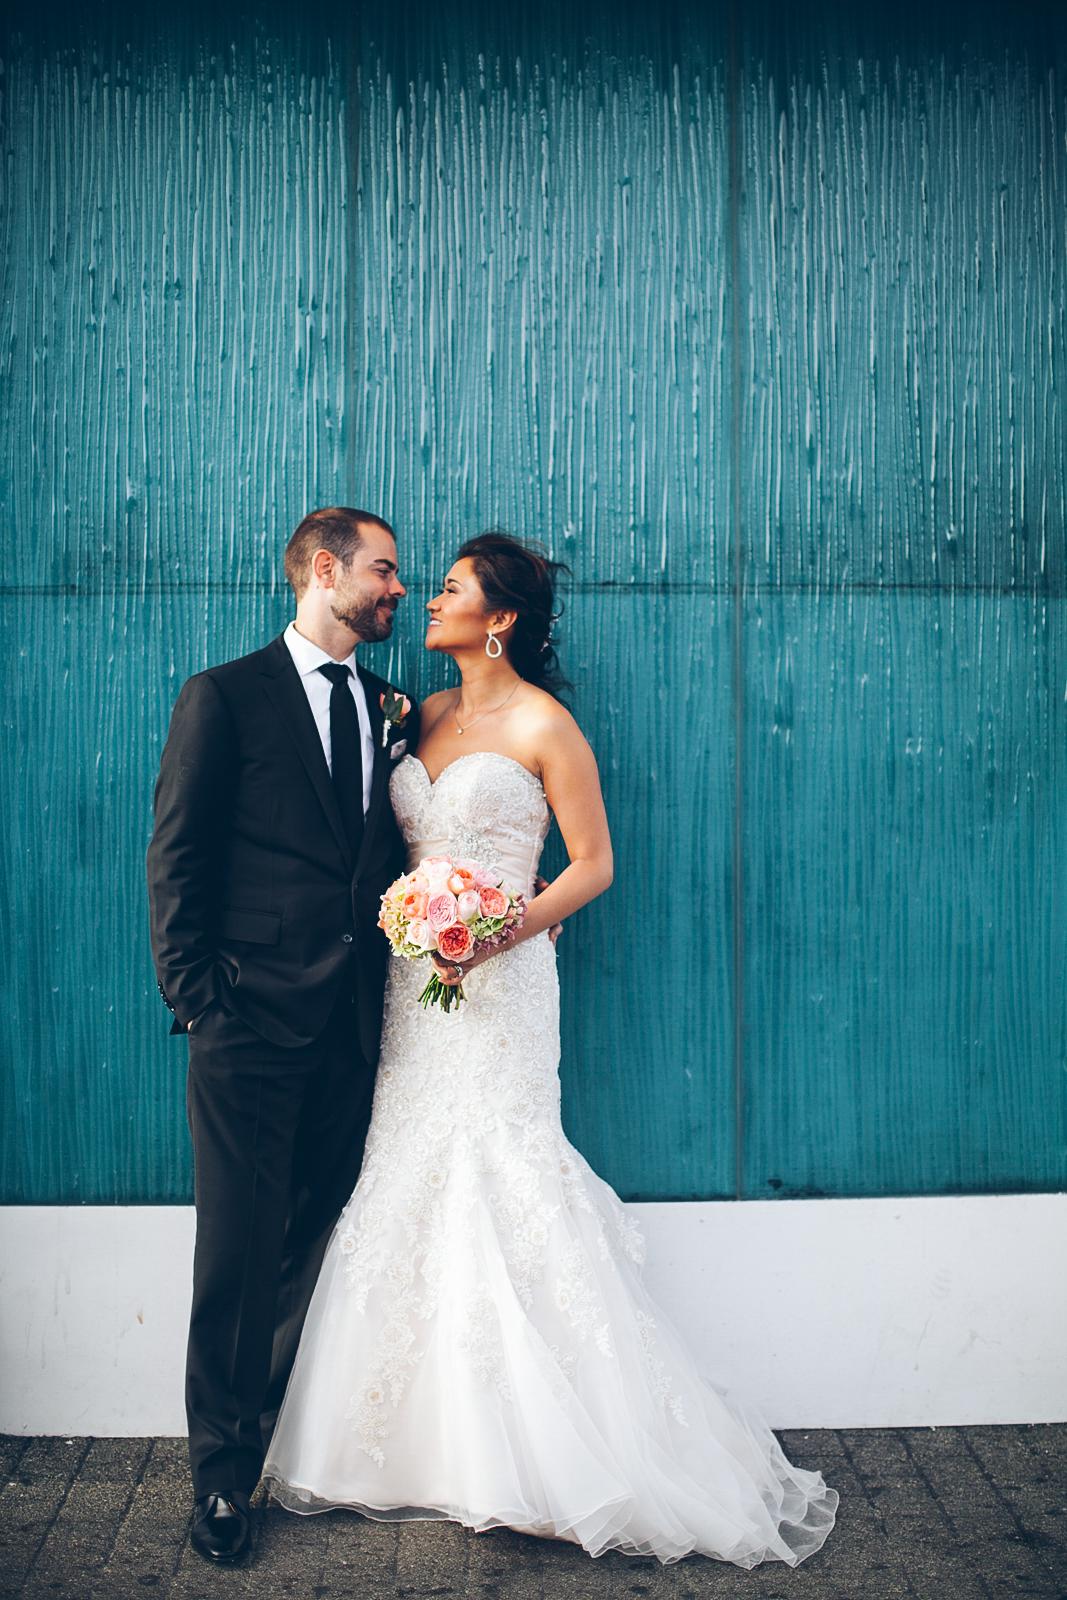 San_francisco_city_hall_wedding_photography_meegan_travis_ebony_siovhan_bokeh_photography_82.jpg